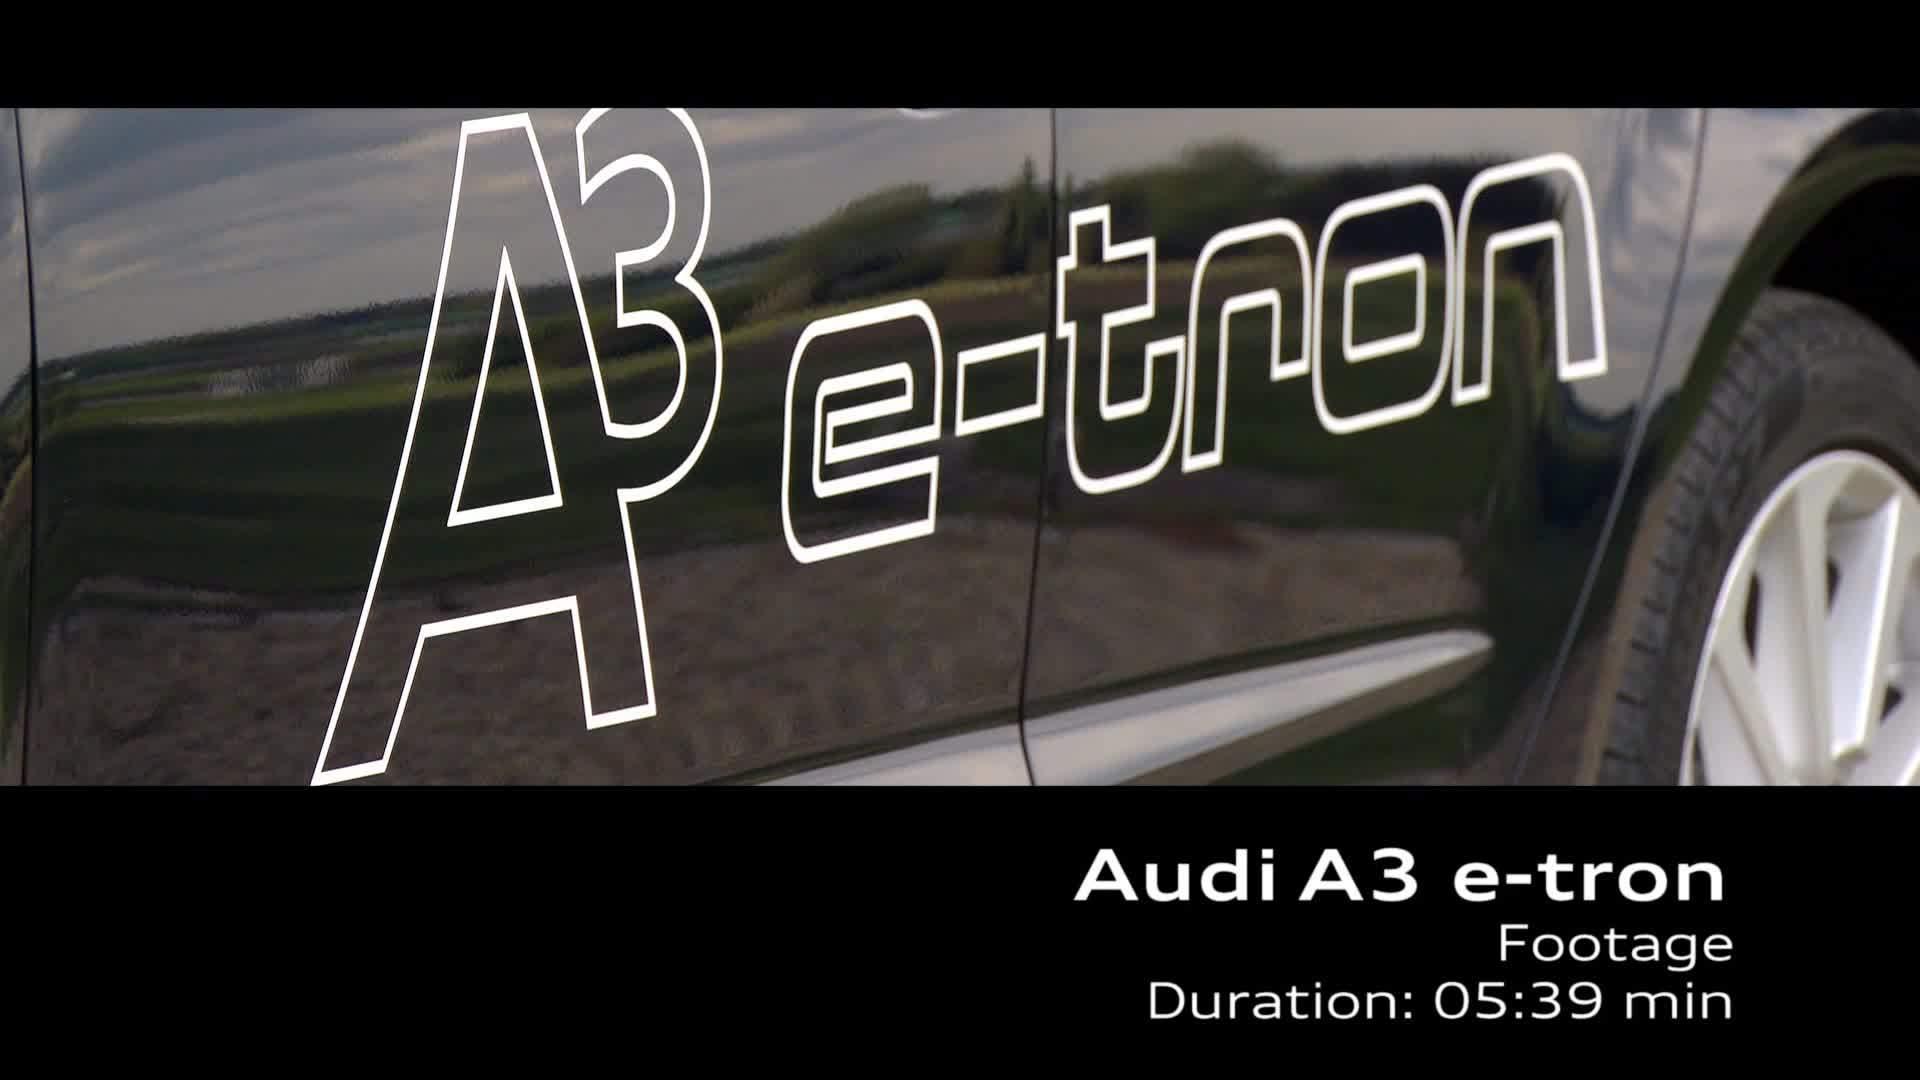 Audi A3 Sportback e-tron - Footage